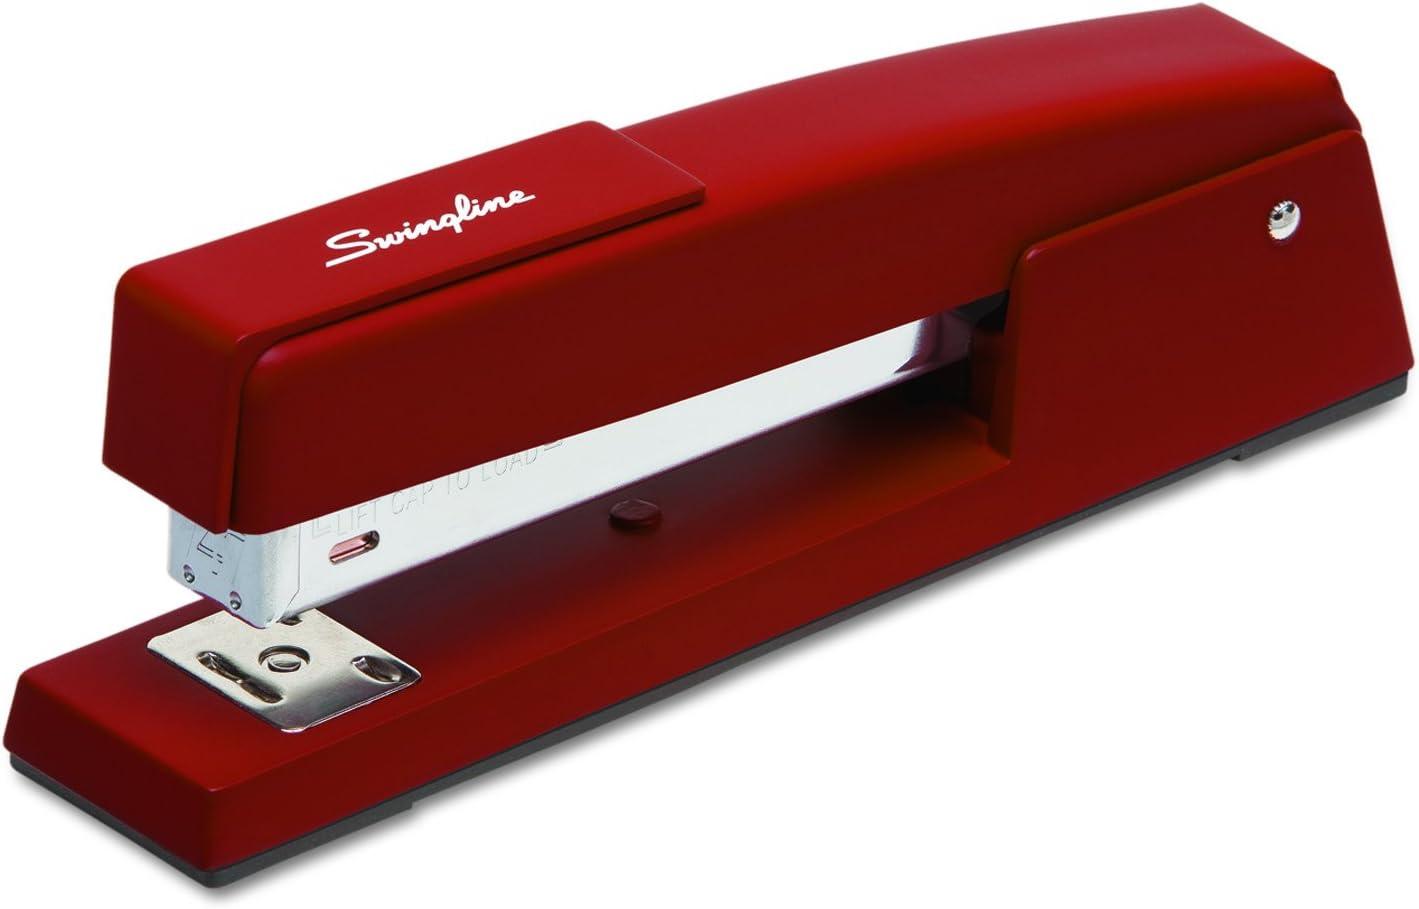 Swingline Stapler, 747 Classic Desktop Stapler, 20 Sheet Capacity, Metal, Lipstick Red (74718)